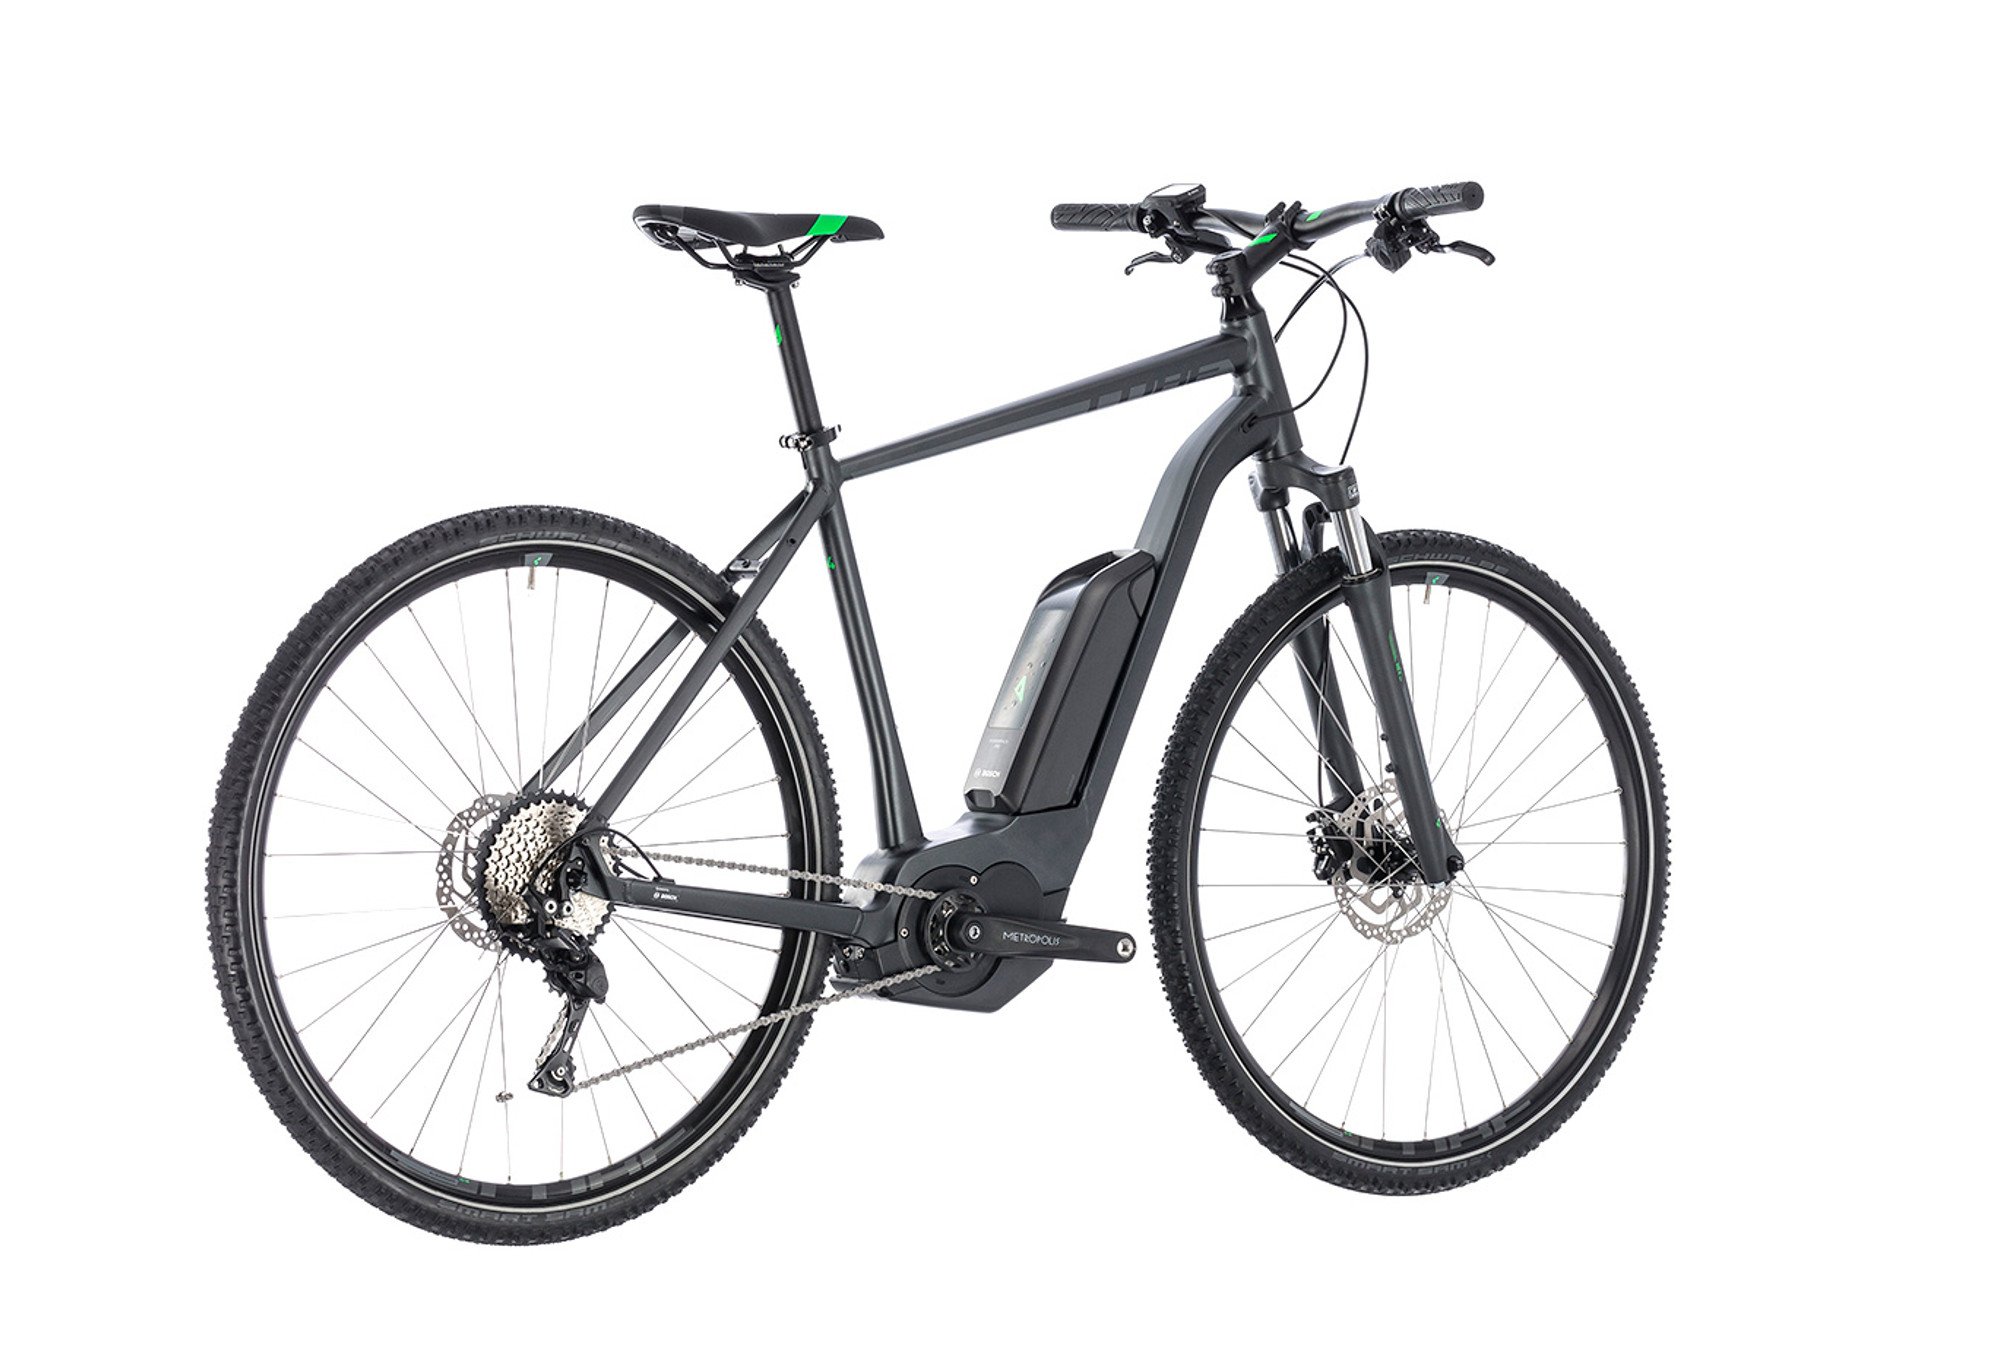 cube 2018 cross hybrid pro 500 hybrid touring bike 700 mm. Black Bedroom Furniture Sets. Home Design Ideas